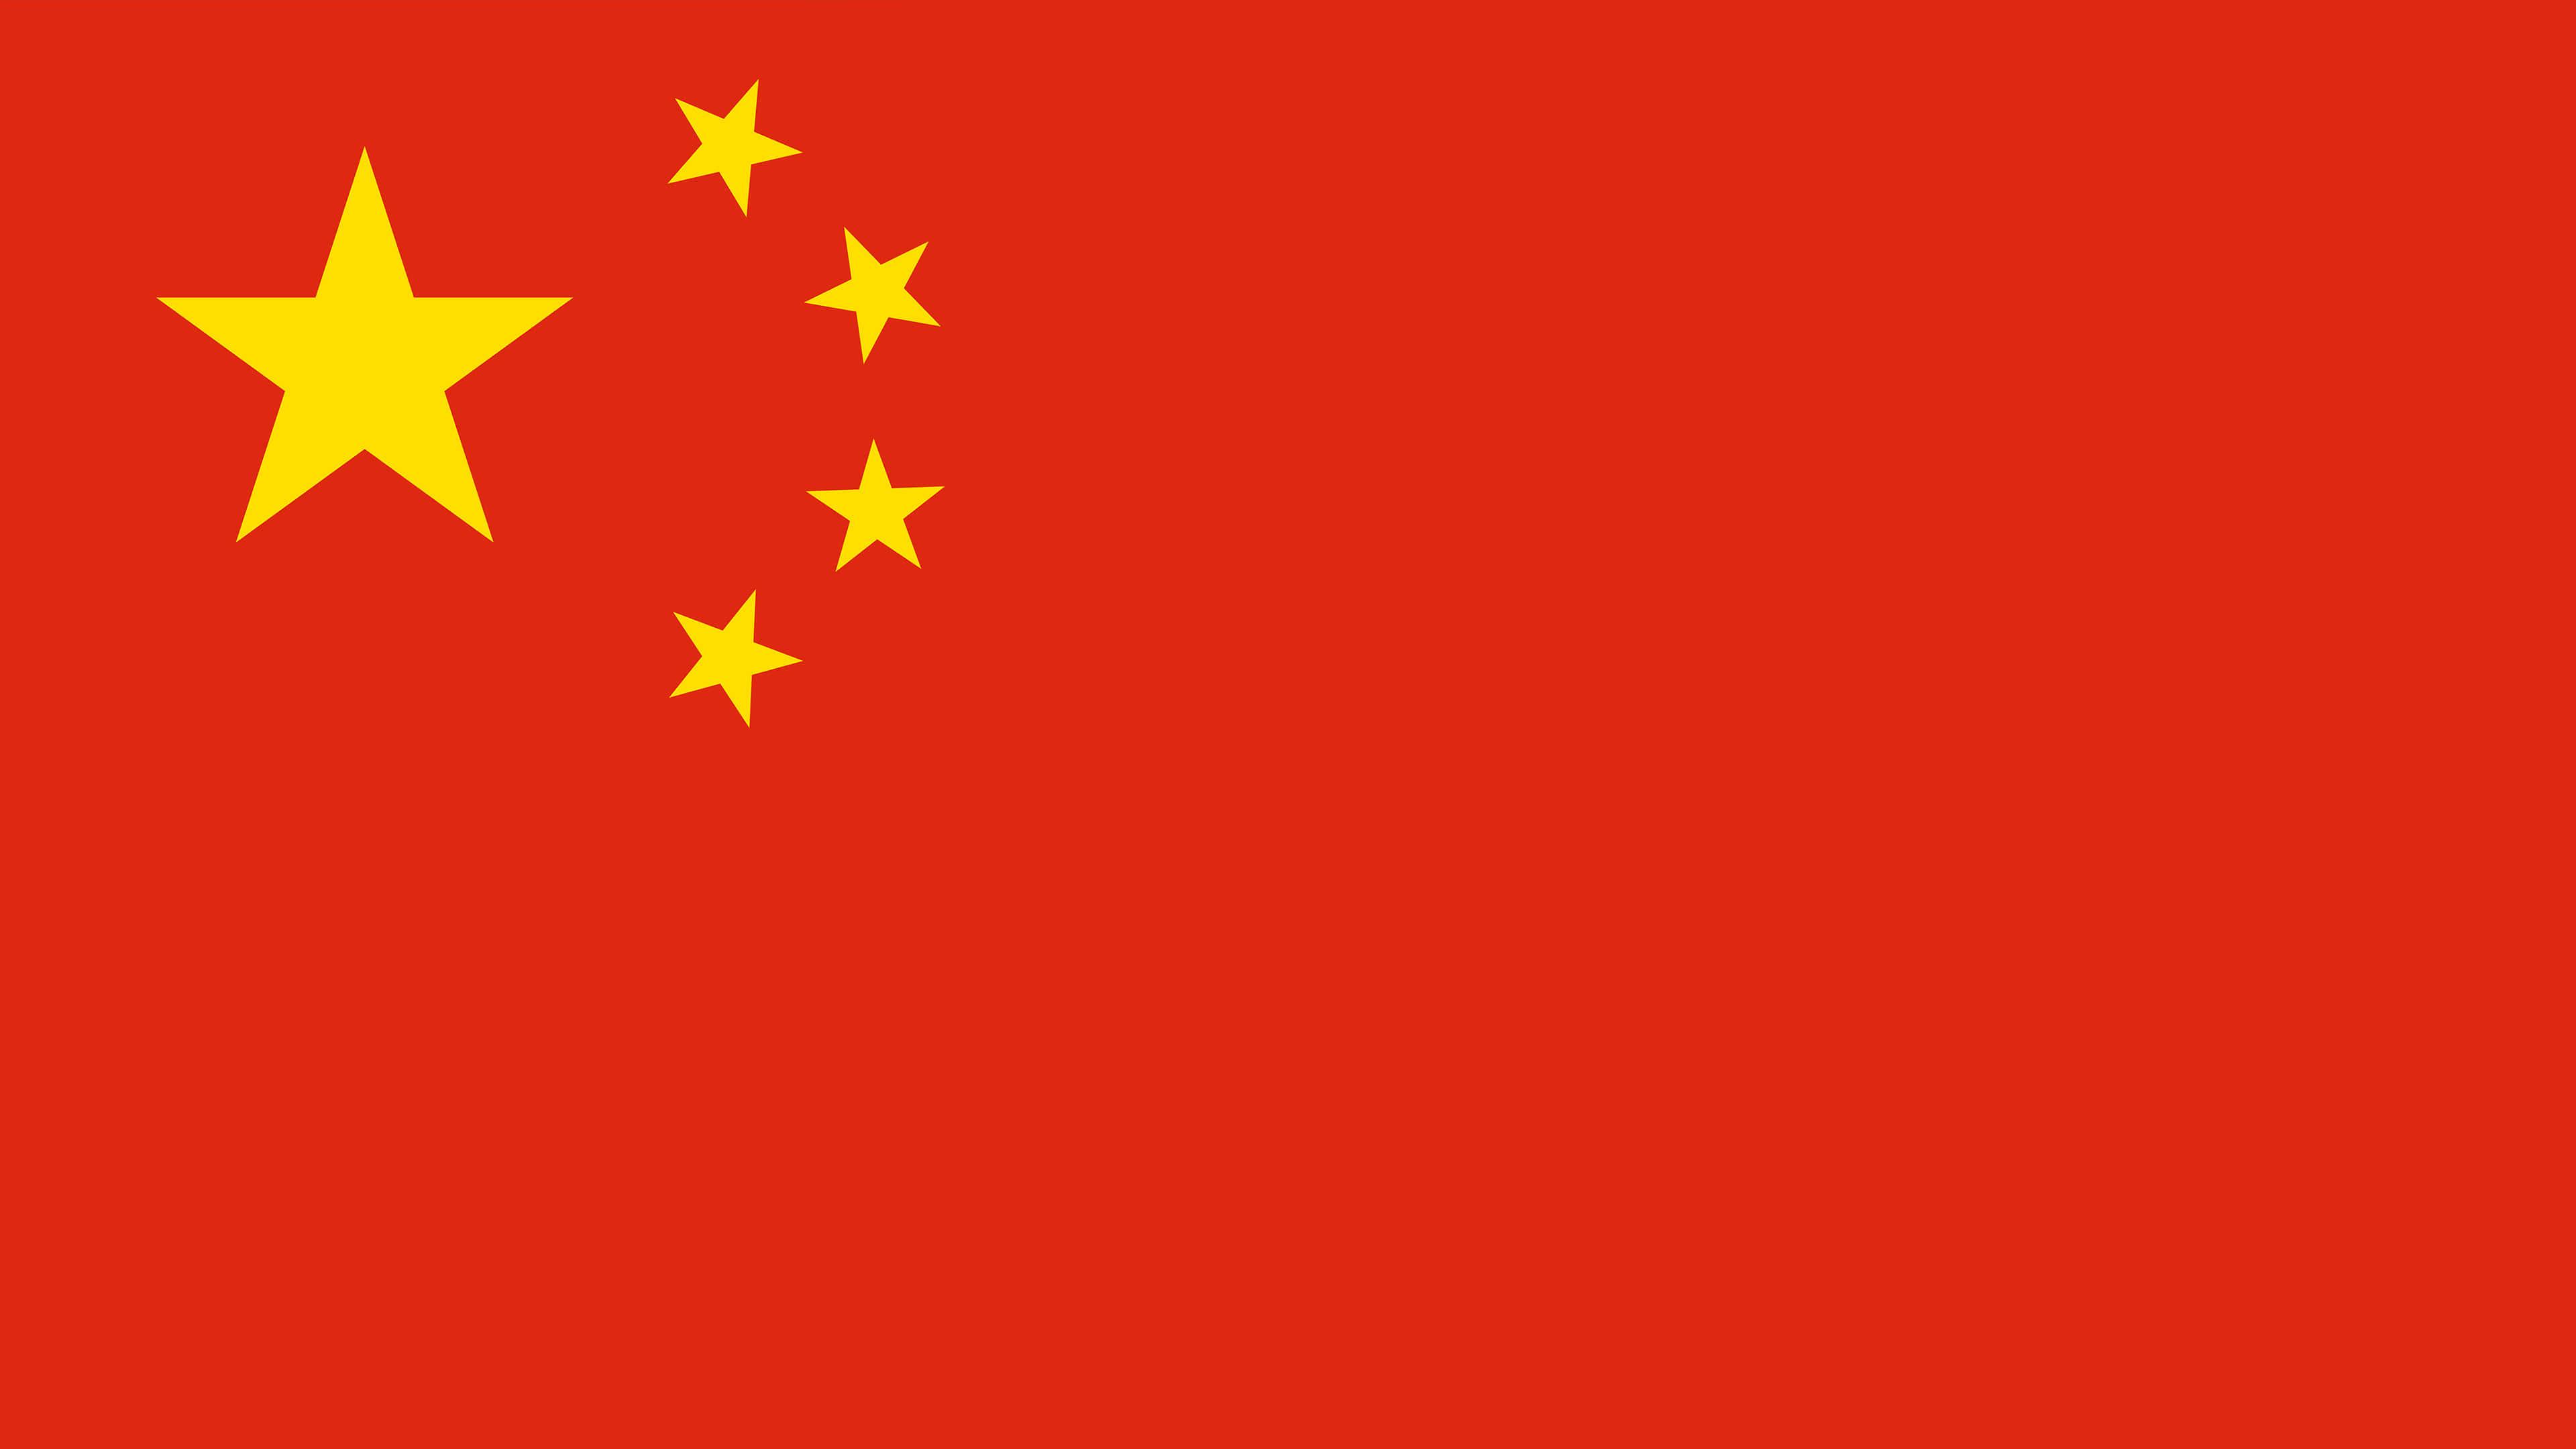 peoples republic of china flag uhd 4k wallpaper